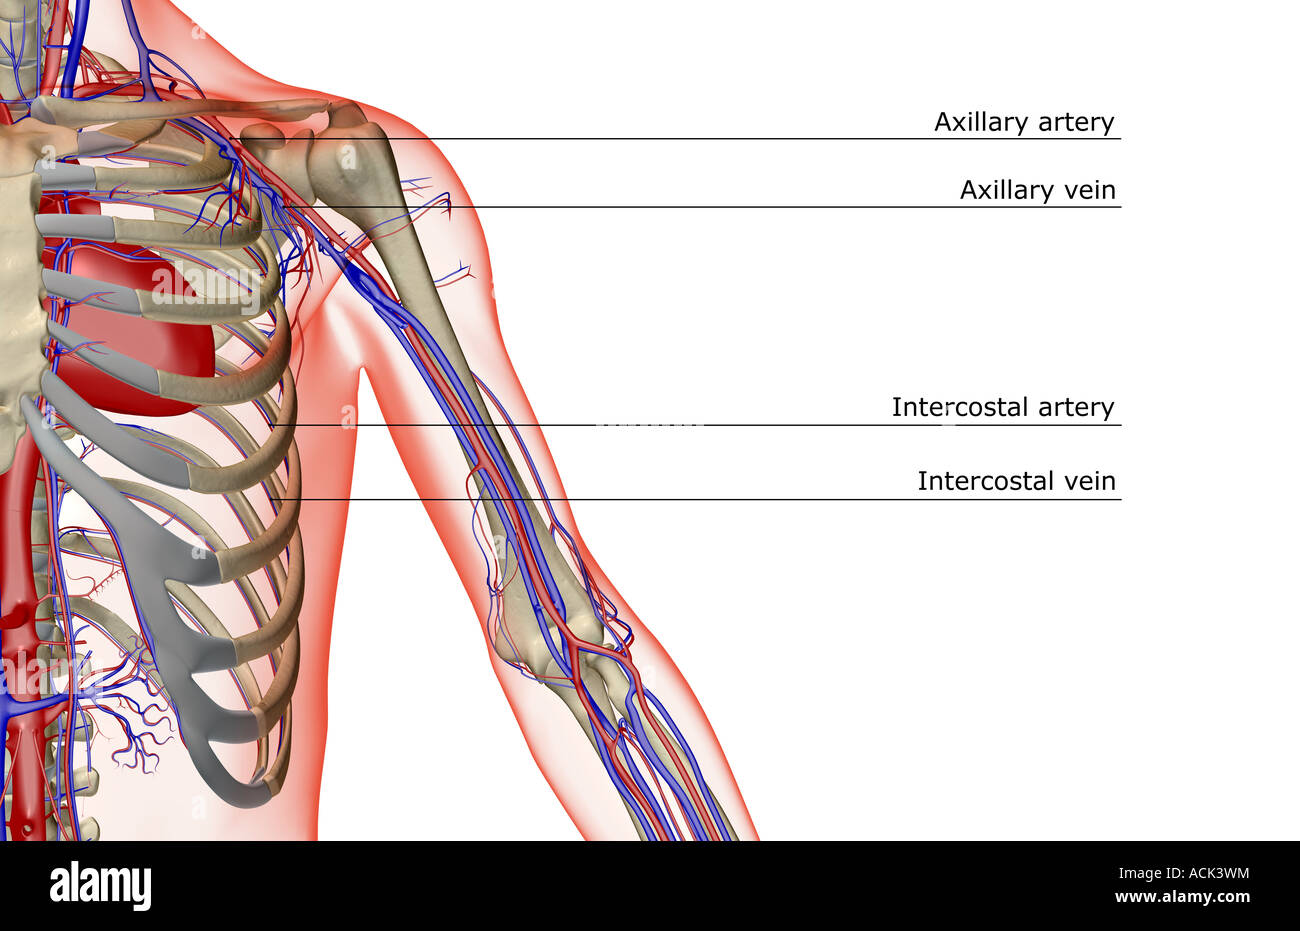 Blood Vessels Arm Stockfotos & Blood Vessels Arm Bilder - Alamy